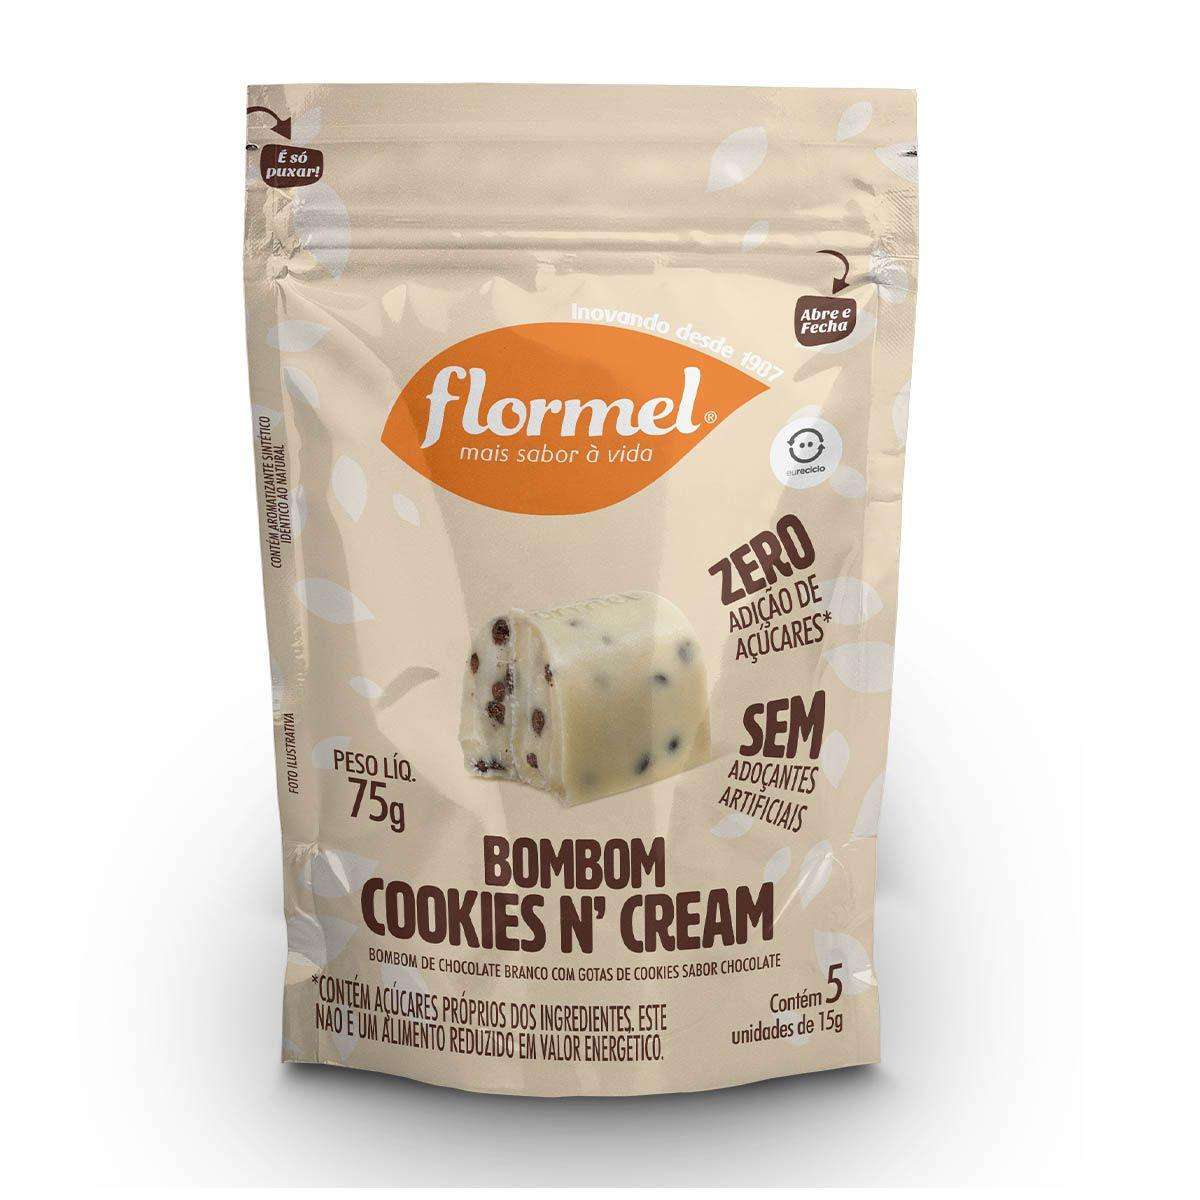 Pacote 5 unidades Bombom Cookies N' Cream (75g) - Flormel